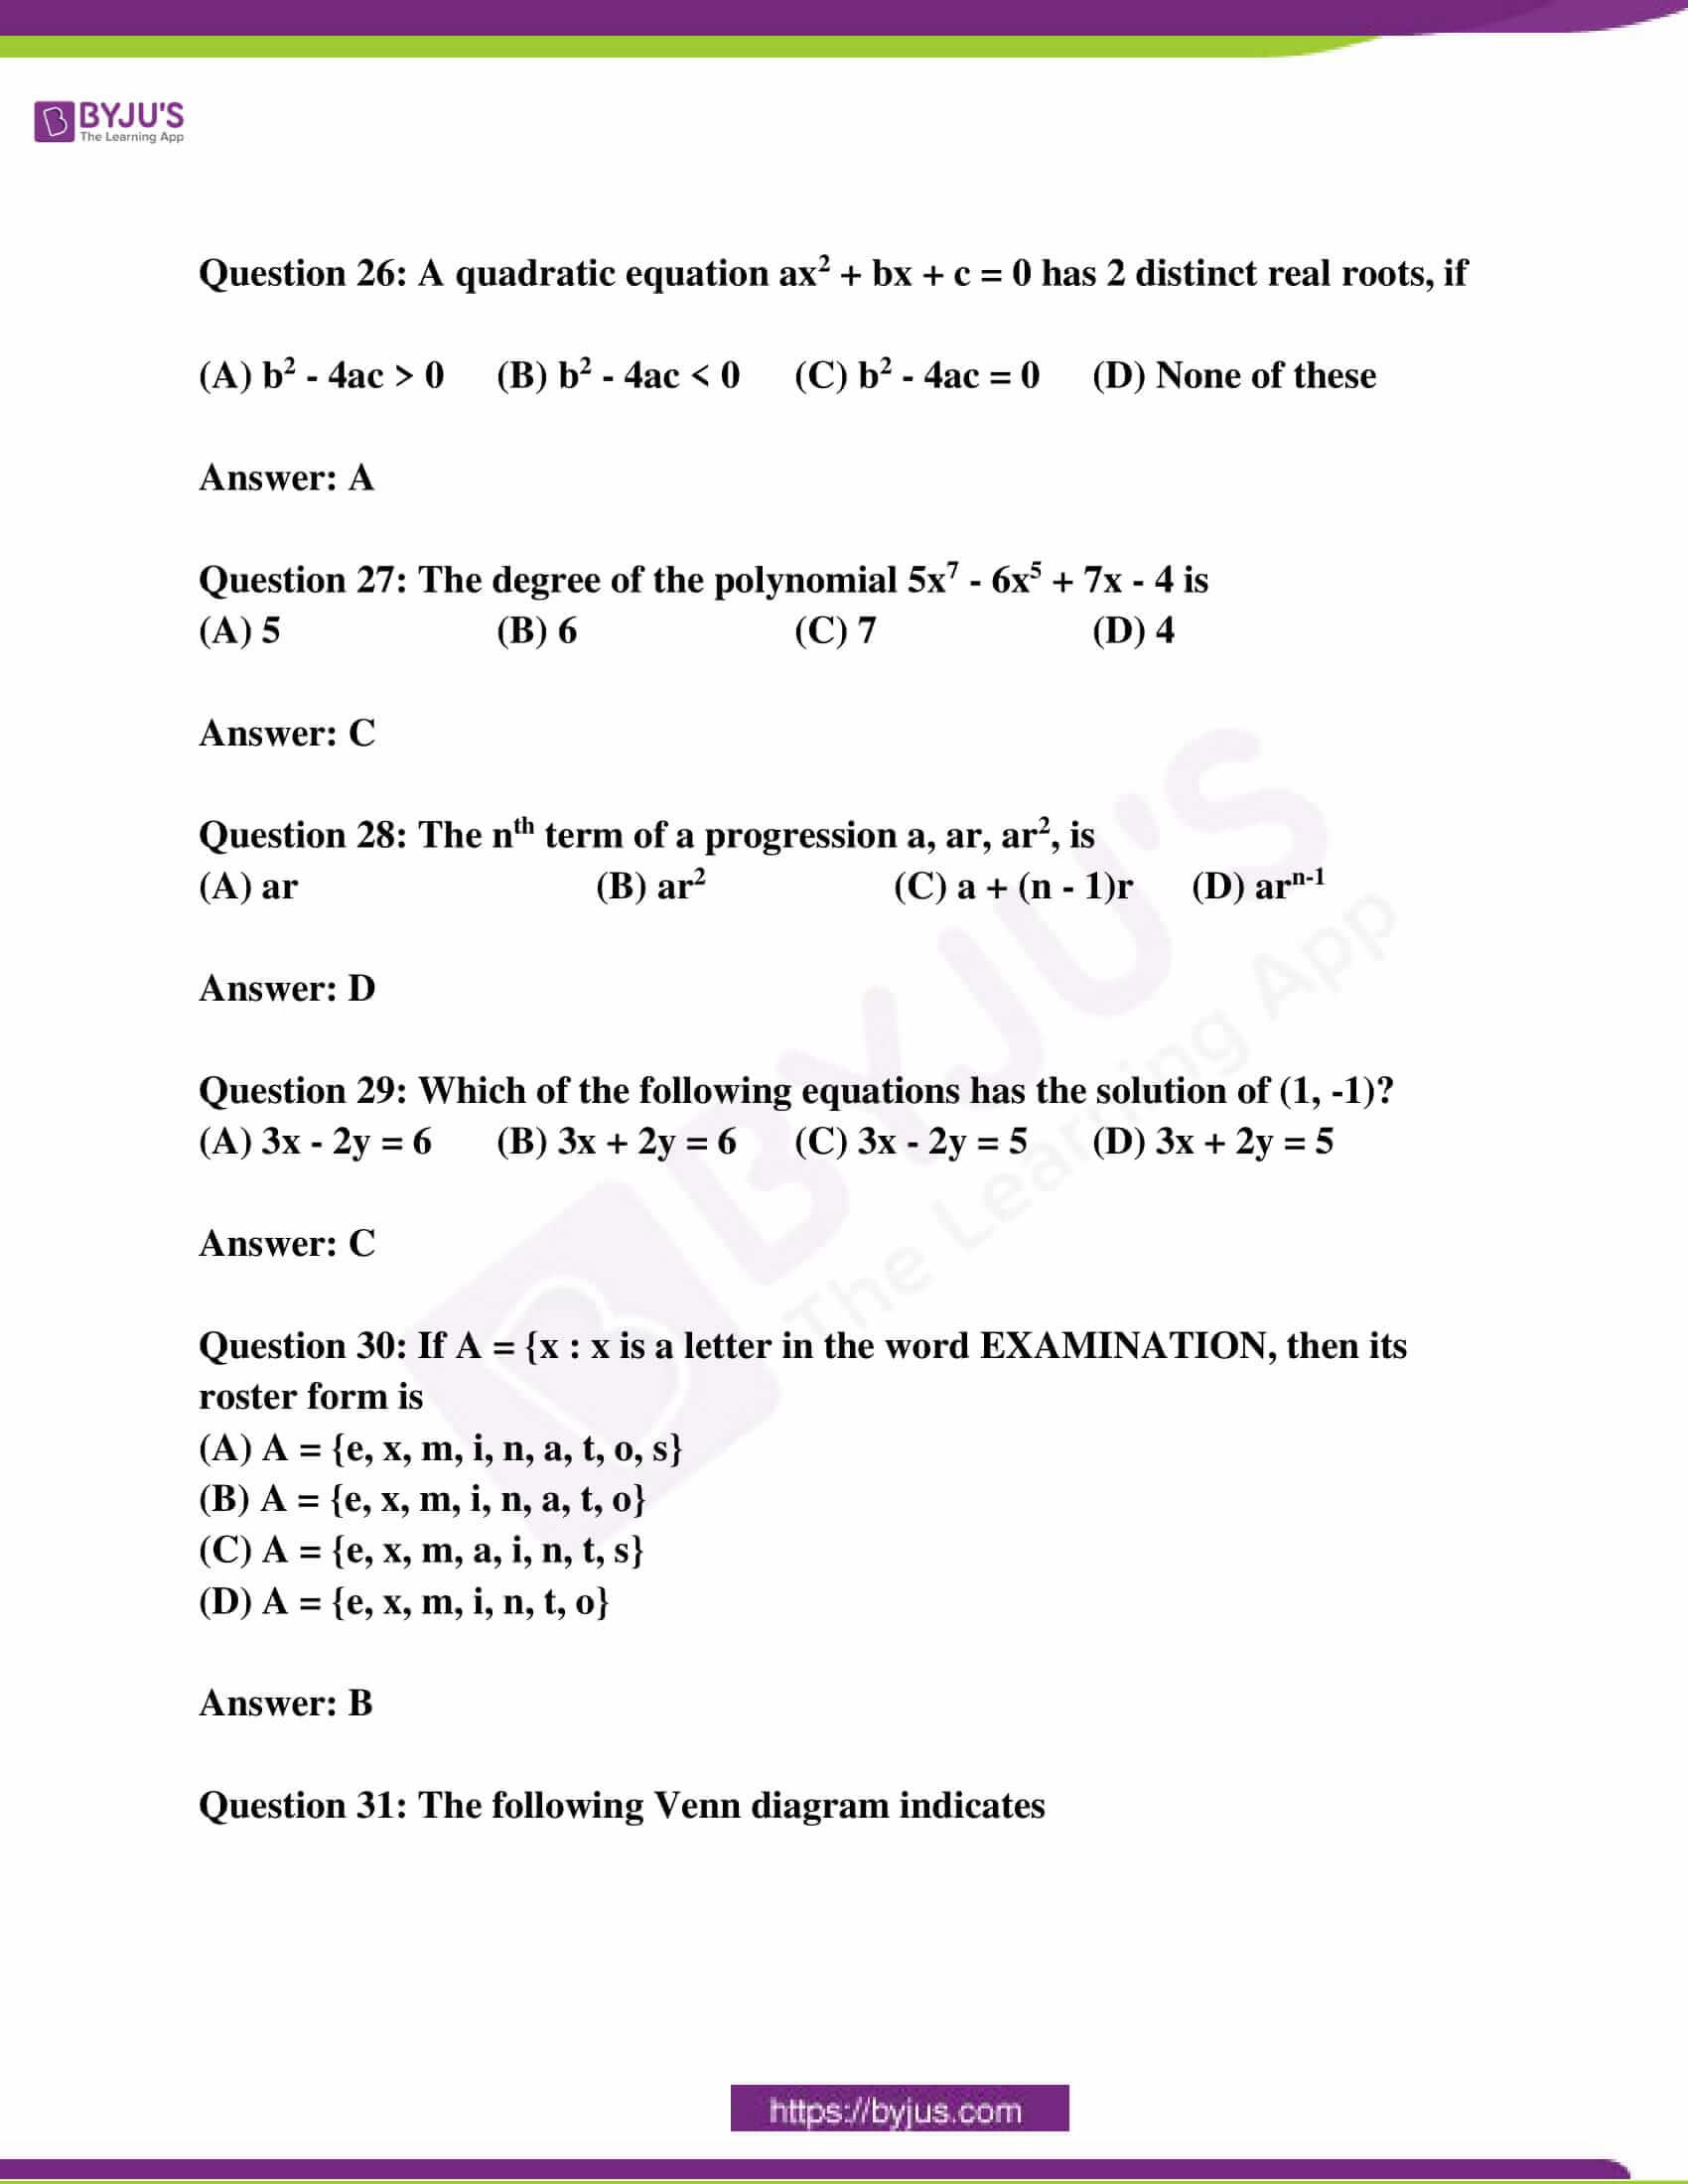 ap class 10 maths question paper 1 sol march 2018 12